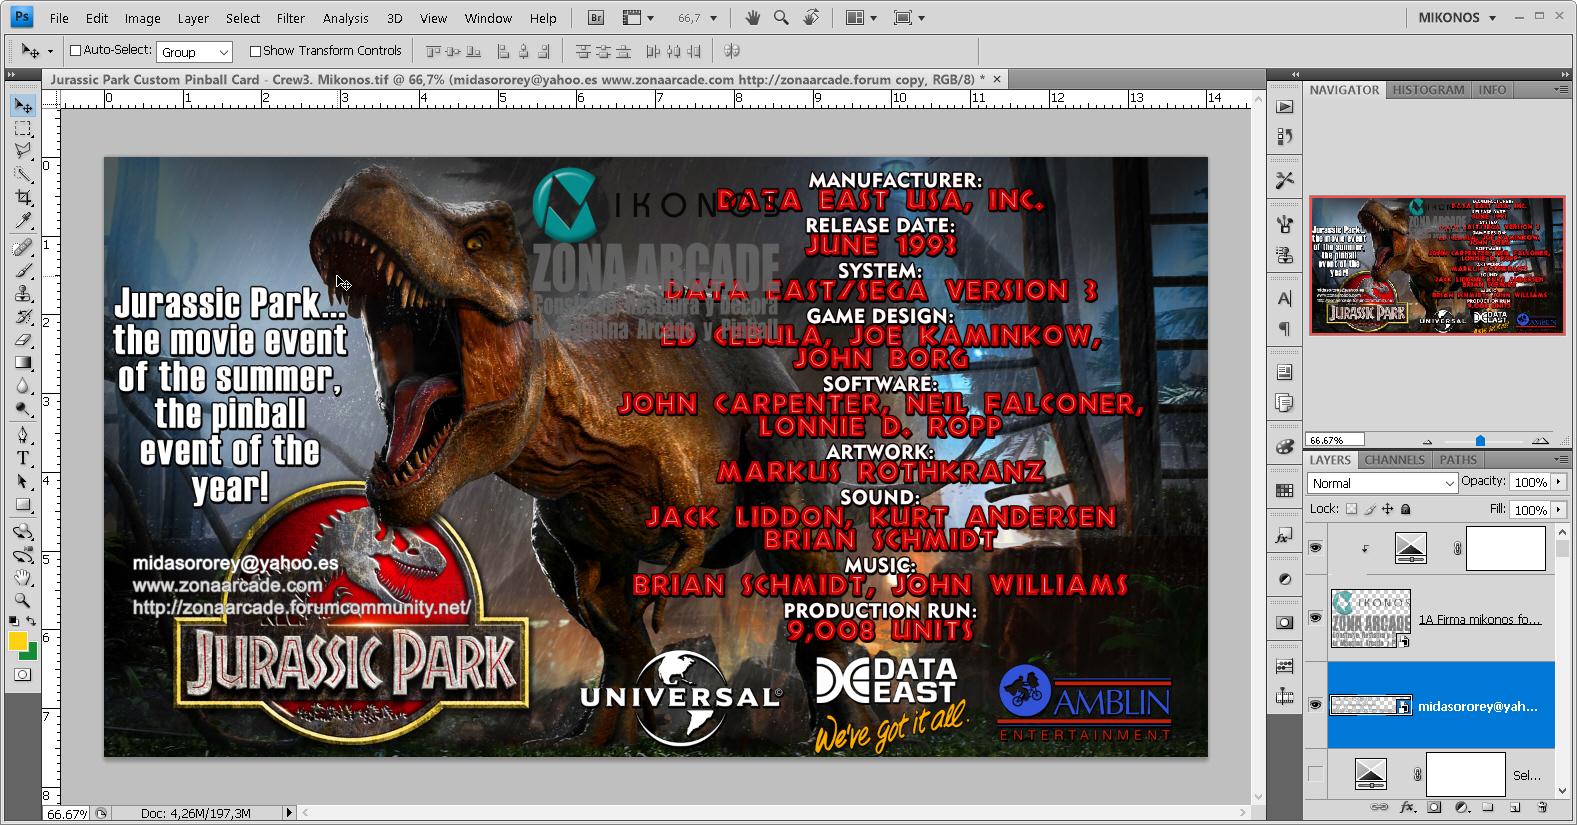 Jurassic-Park-Custom-Pinball-Card-Crew2-Mikonos1.jpg